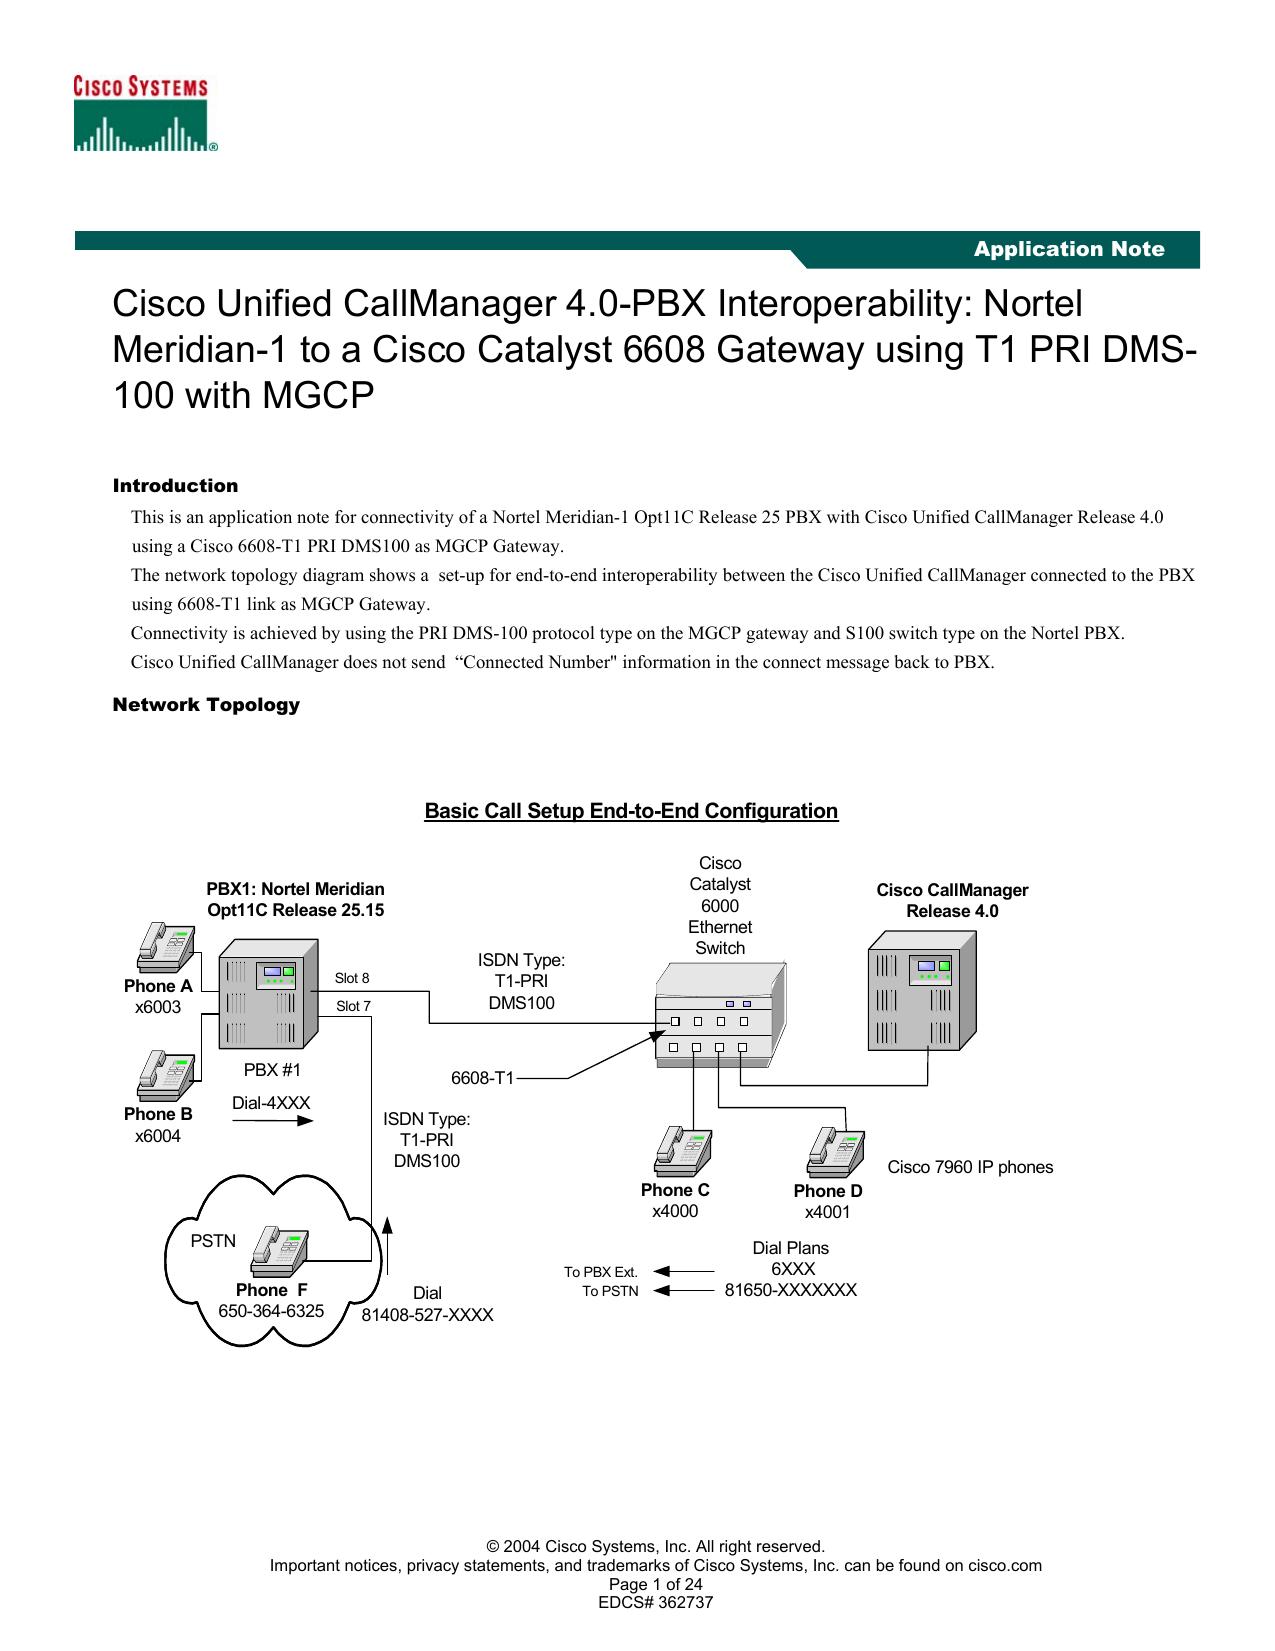 Cisco Unified CallManager 4 0-PBX Interoperability: Nortel